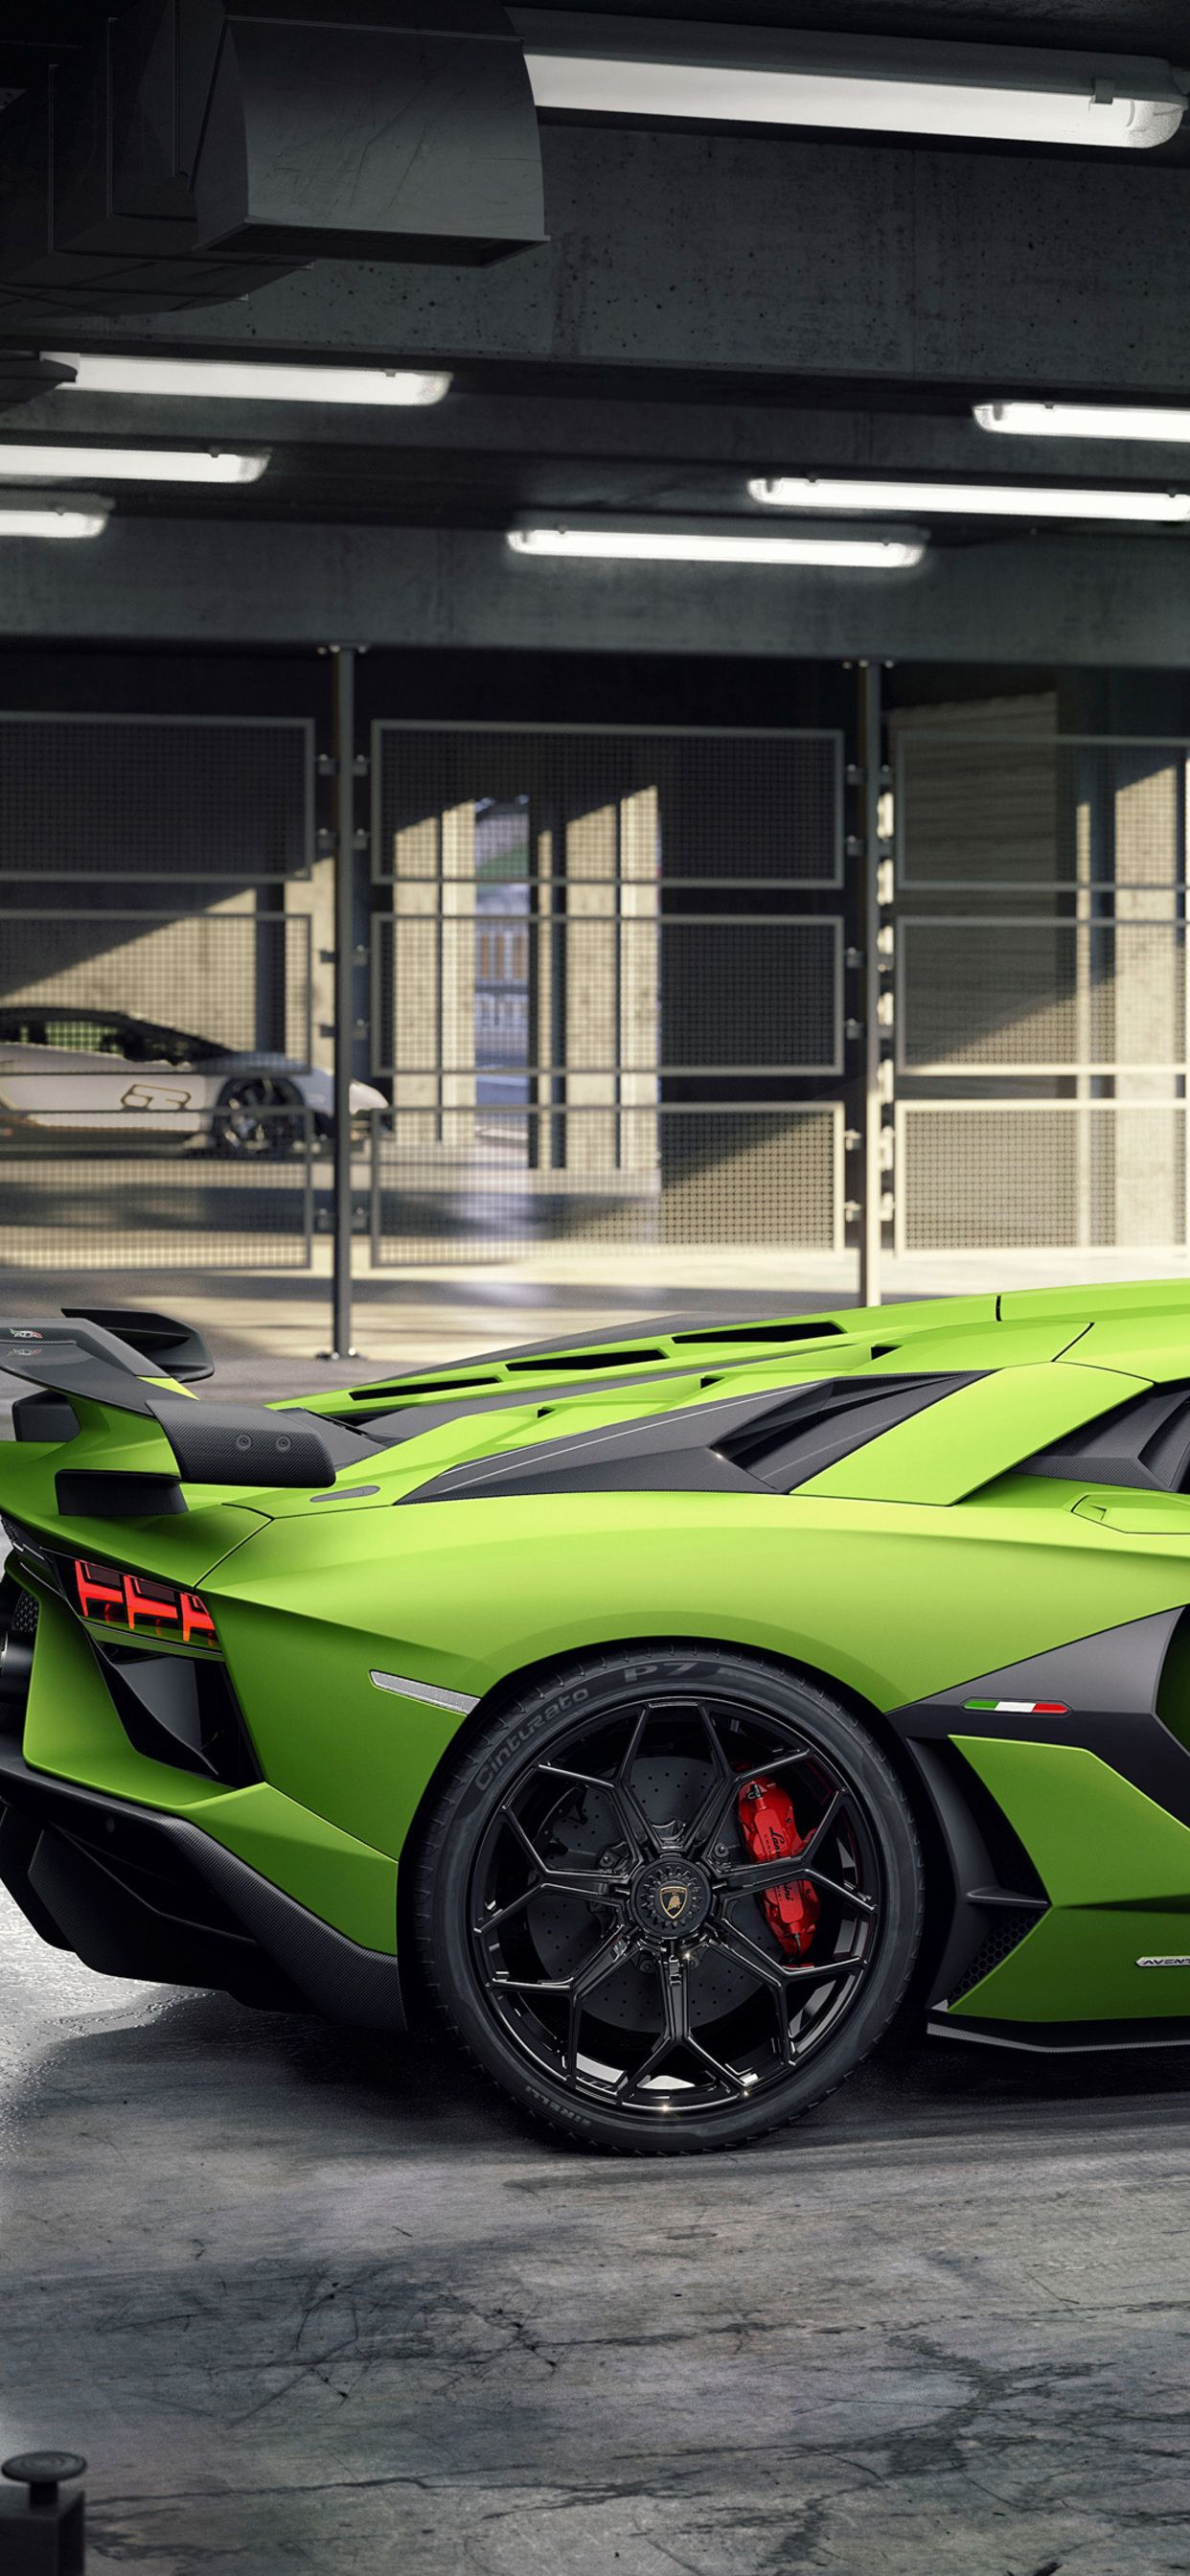 Lamborghini Aventador Svj Wallpaper Best Luxury Cars Luxury Cars Super Cars